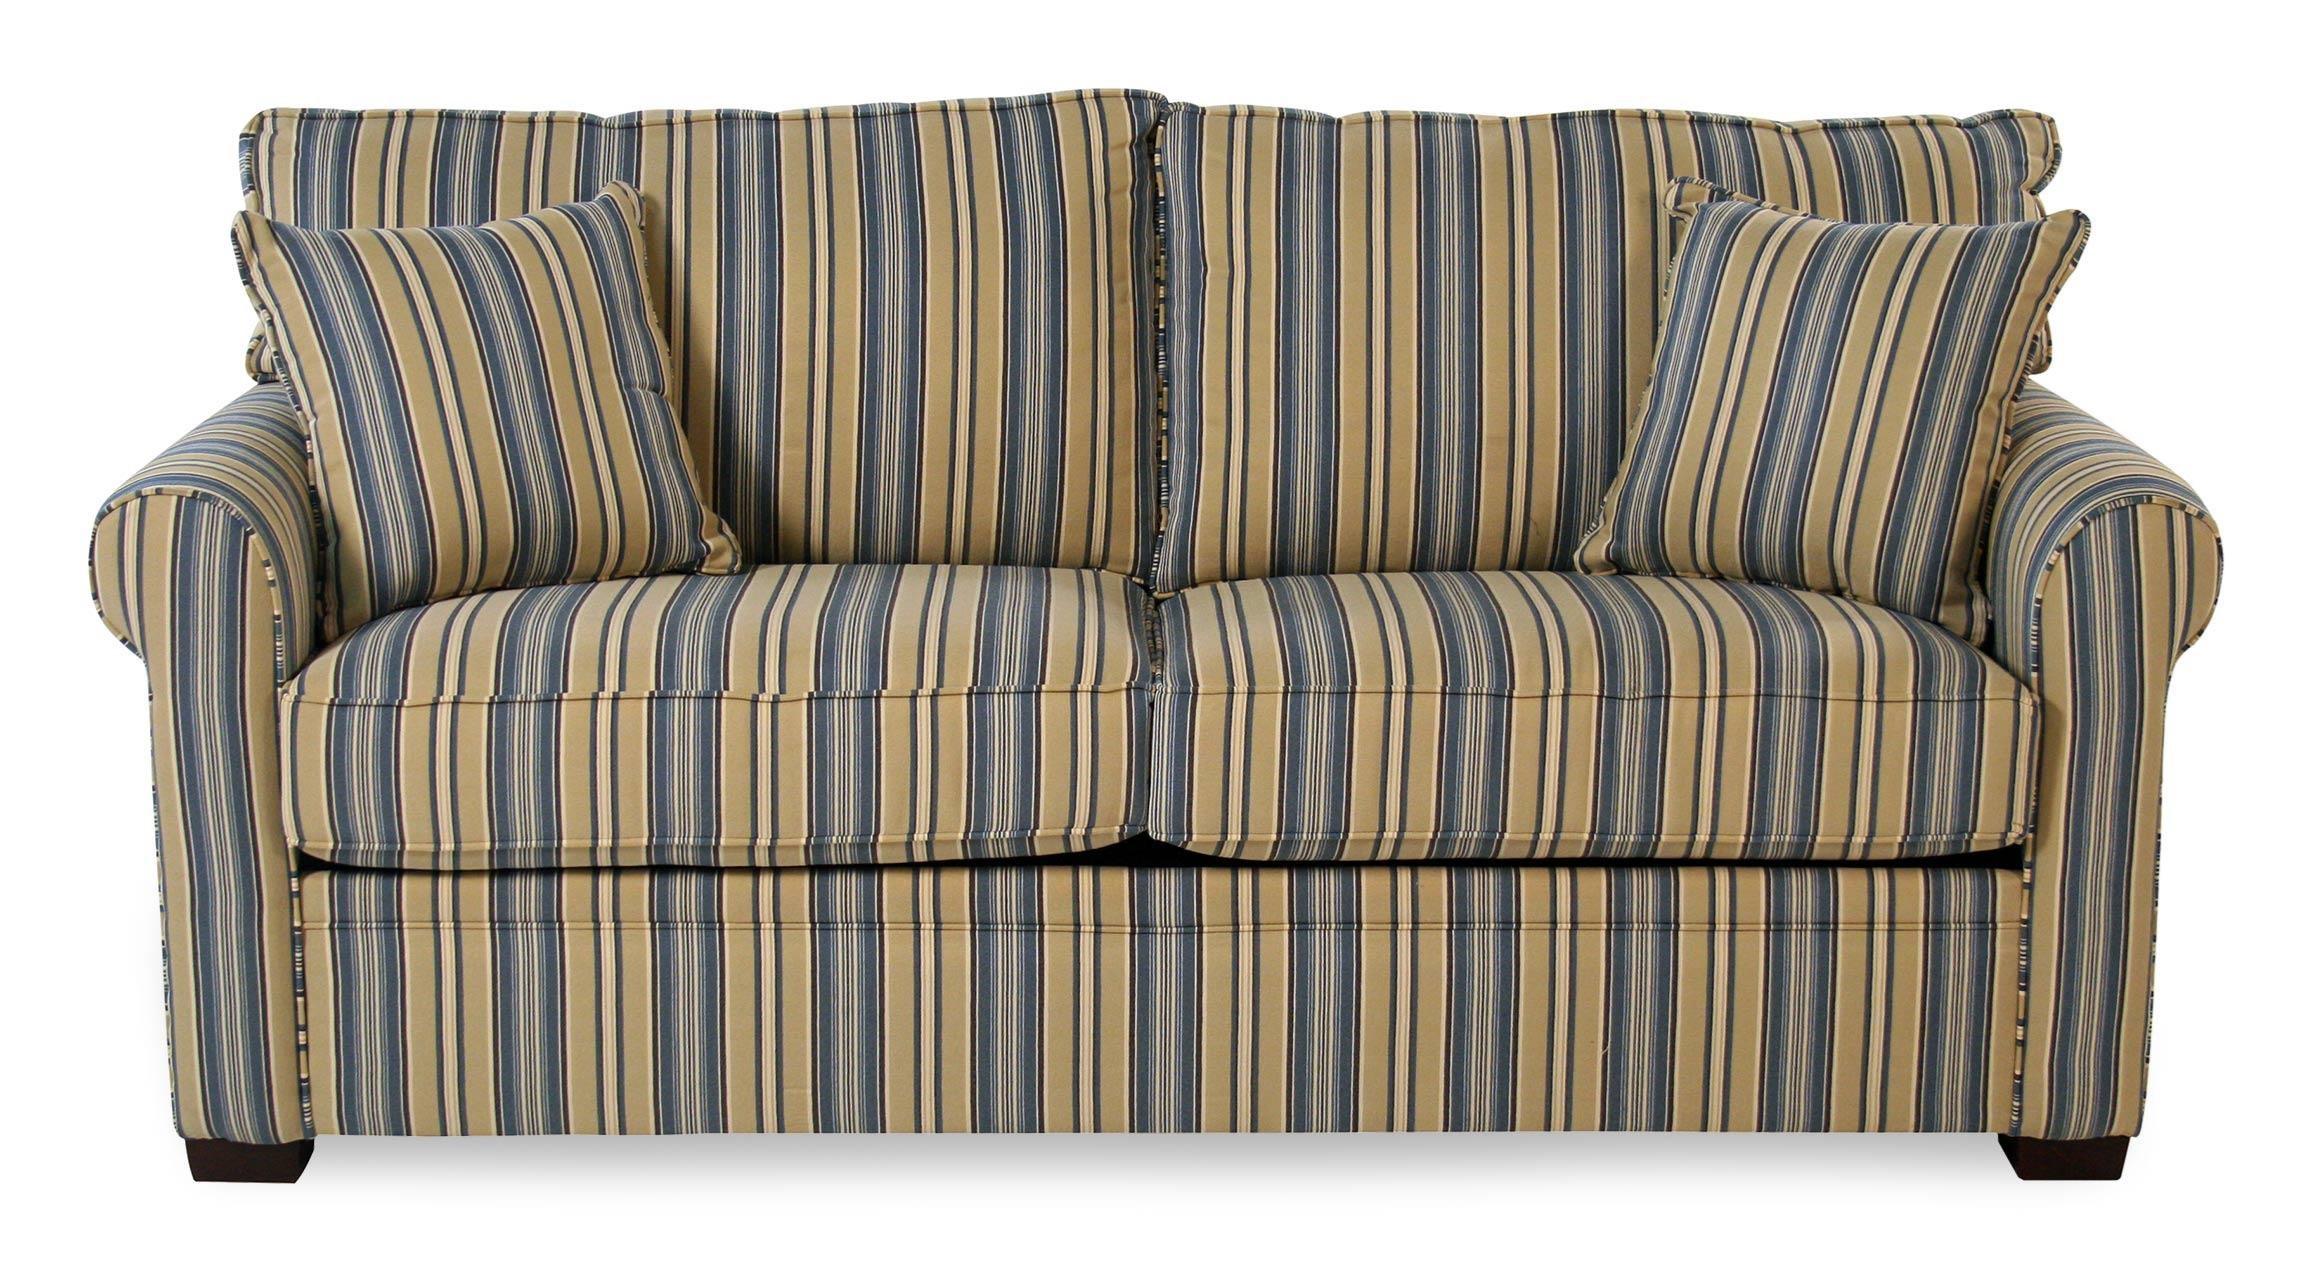 queen size memory foam mattress for sleeper sofa leather au madison manor manorsleep w gel manorsleepqueen